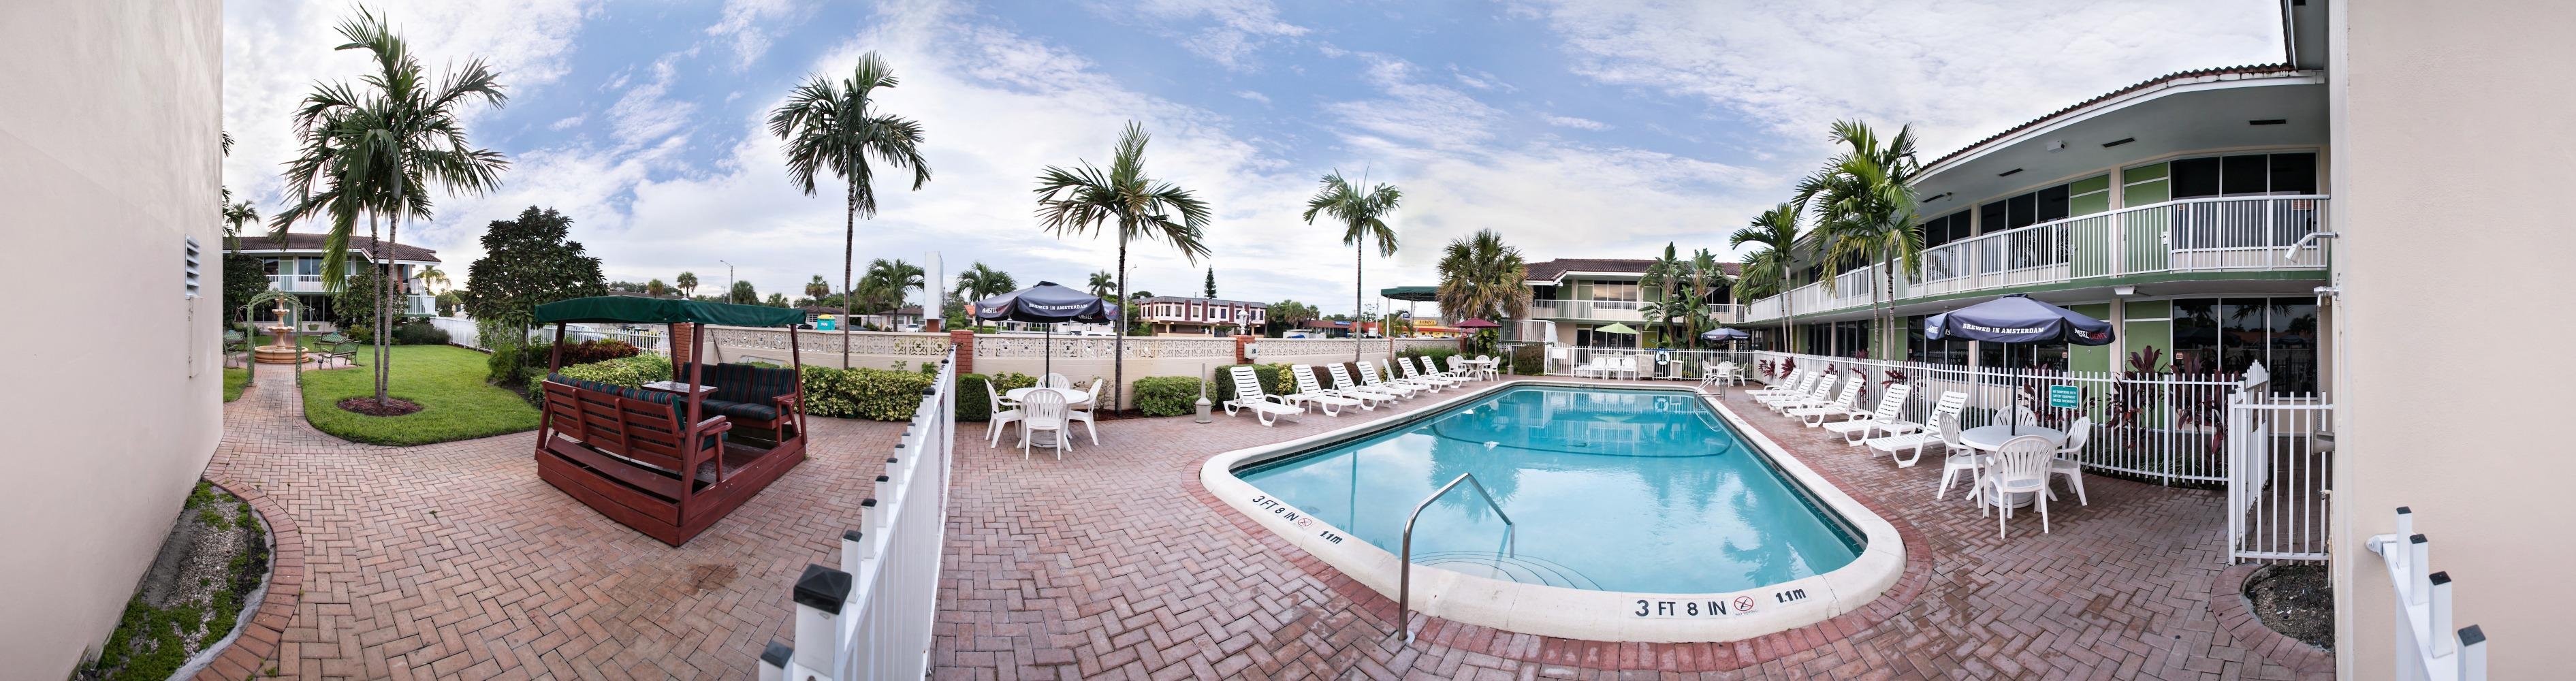 Quality Inn & Suites Hollywood Boulevard Port Everglades Cruise Port Hotel